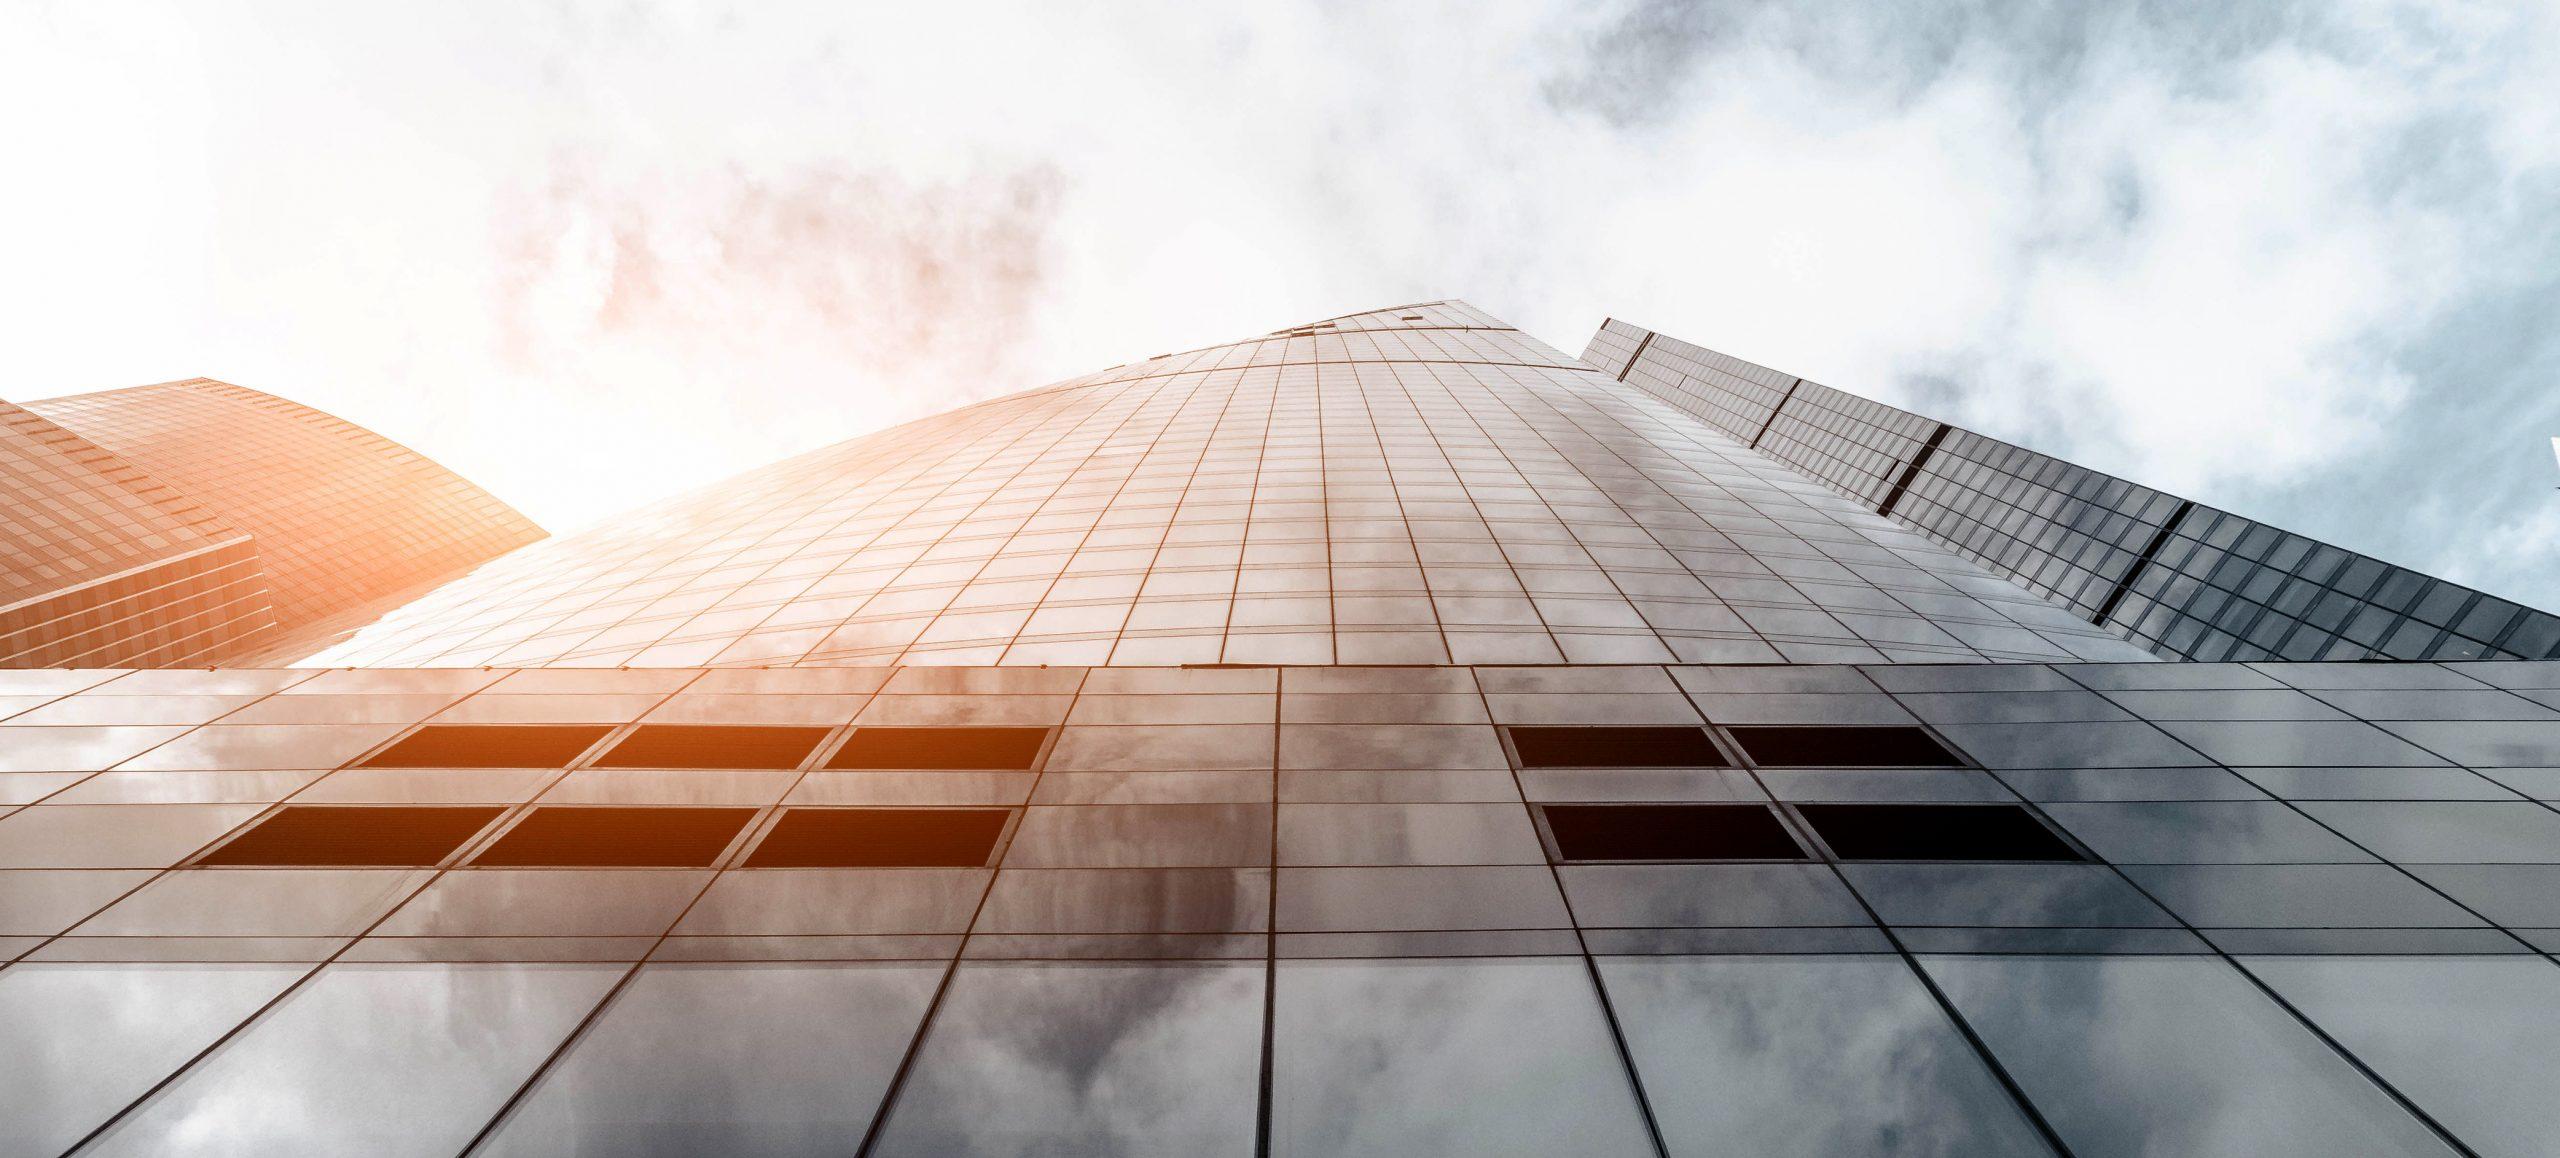 financial services skyscraper